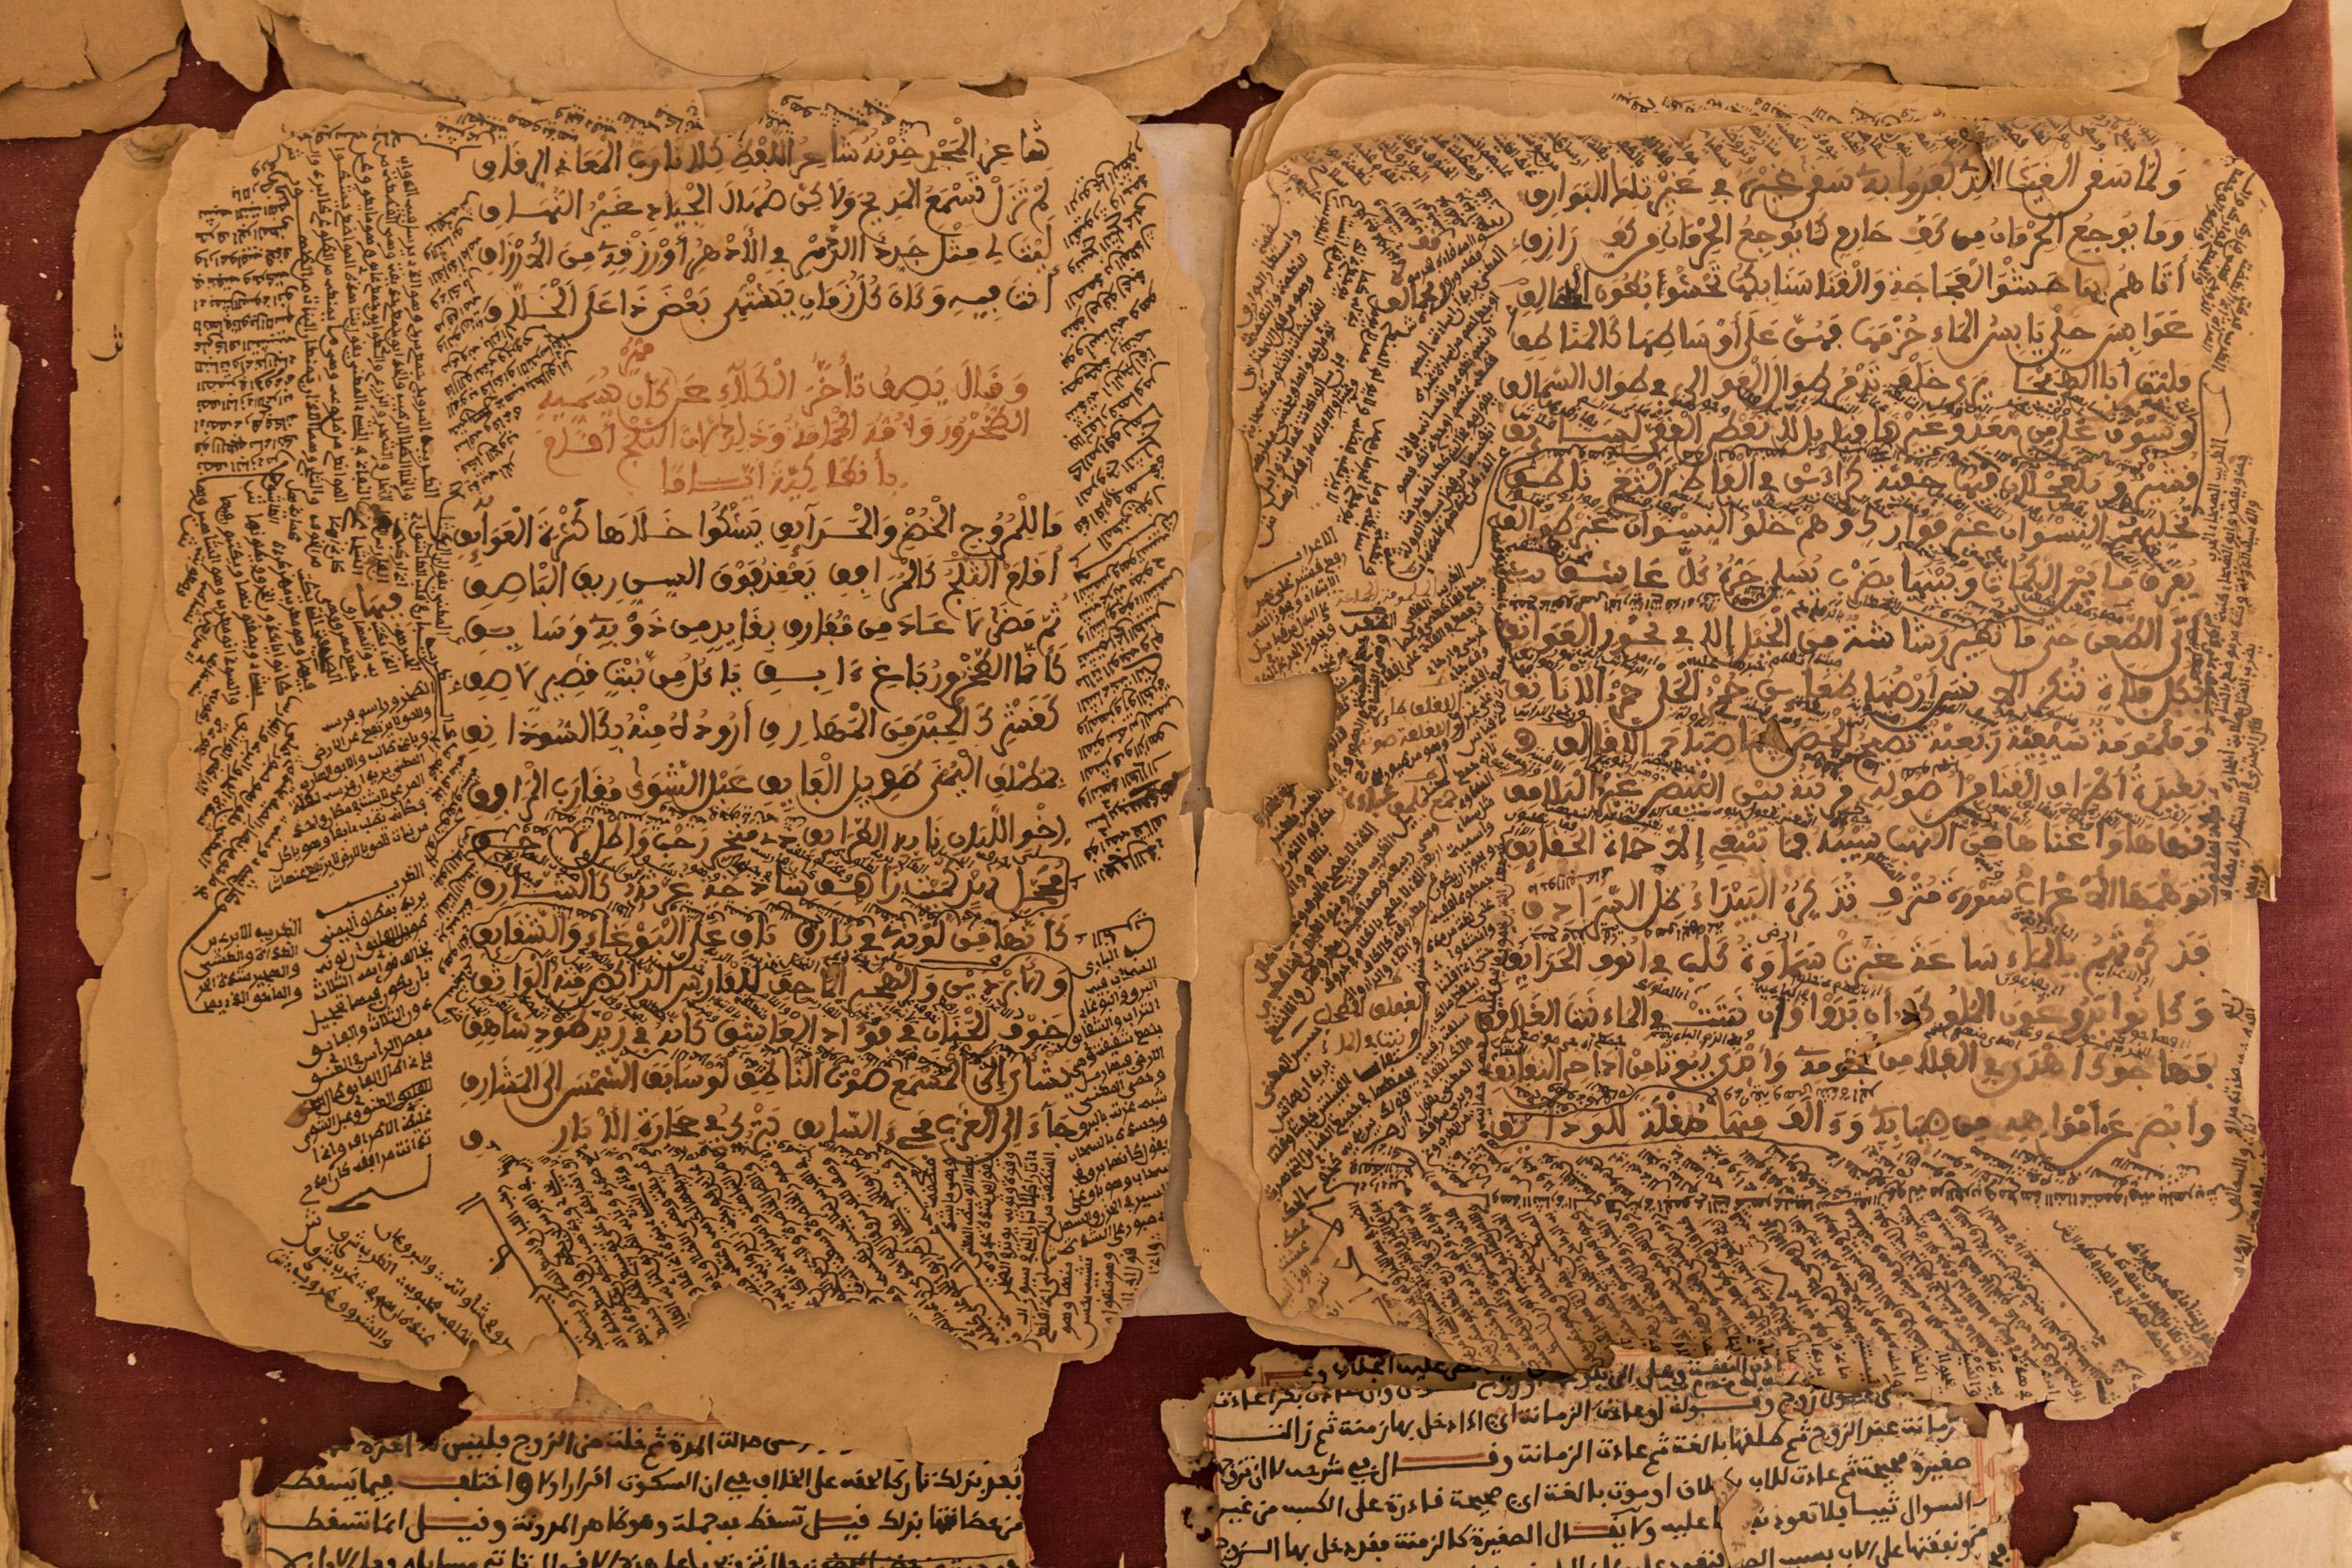 Mali, Timbuctù, atelier di calligrafia di Boubacar Sadek